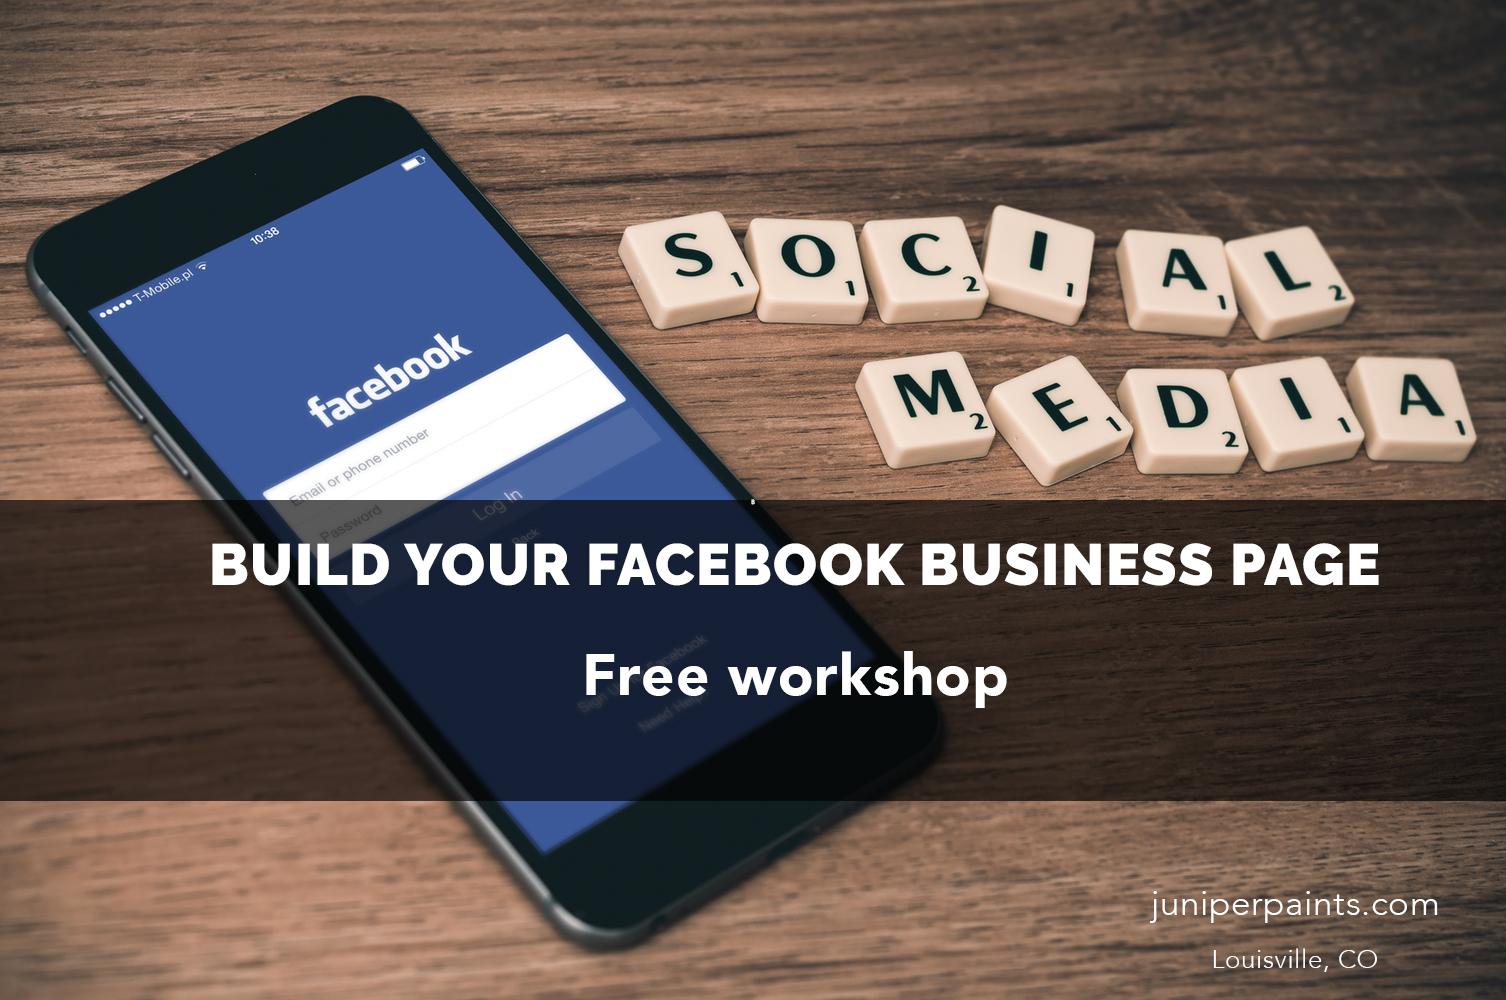 business-page-workshop.jpg